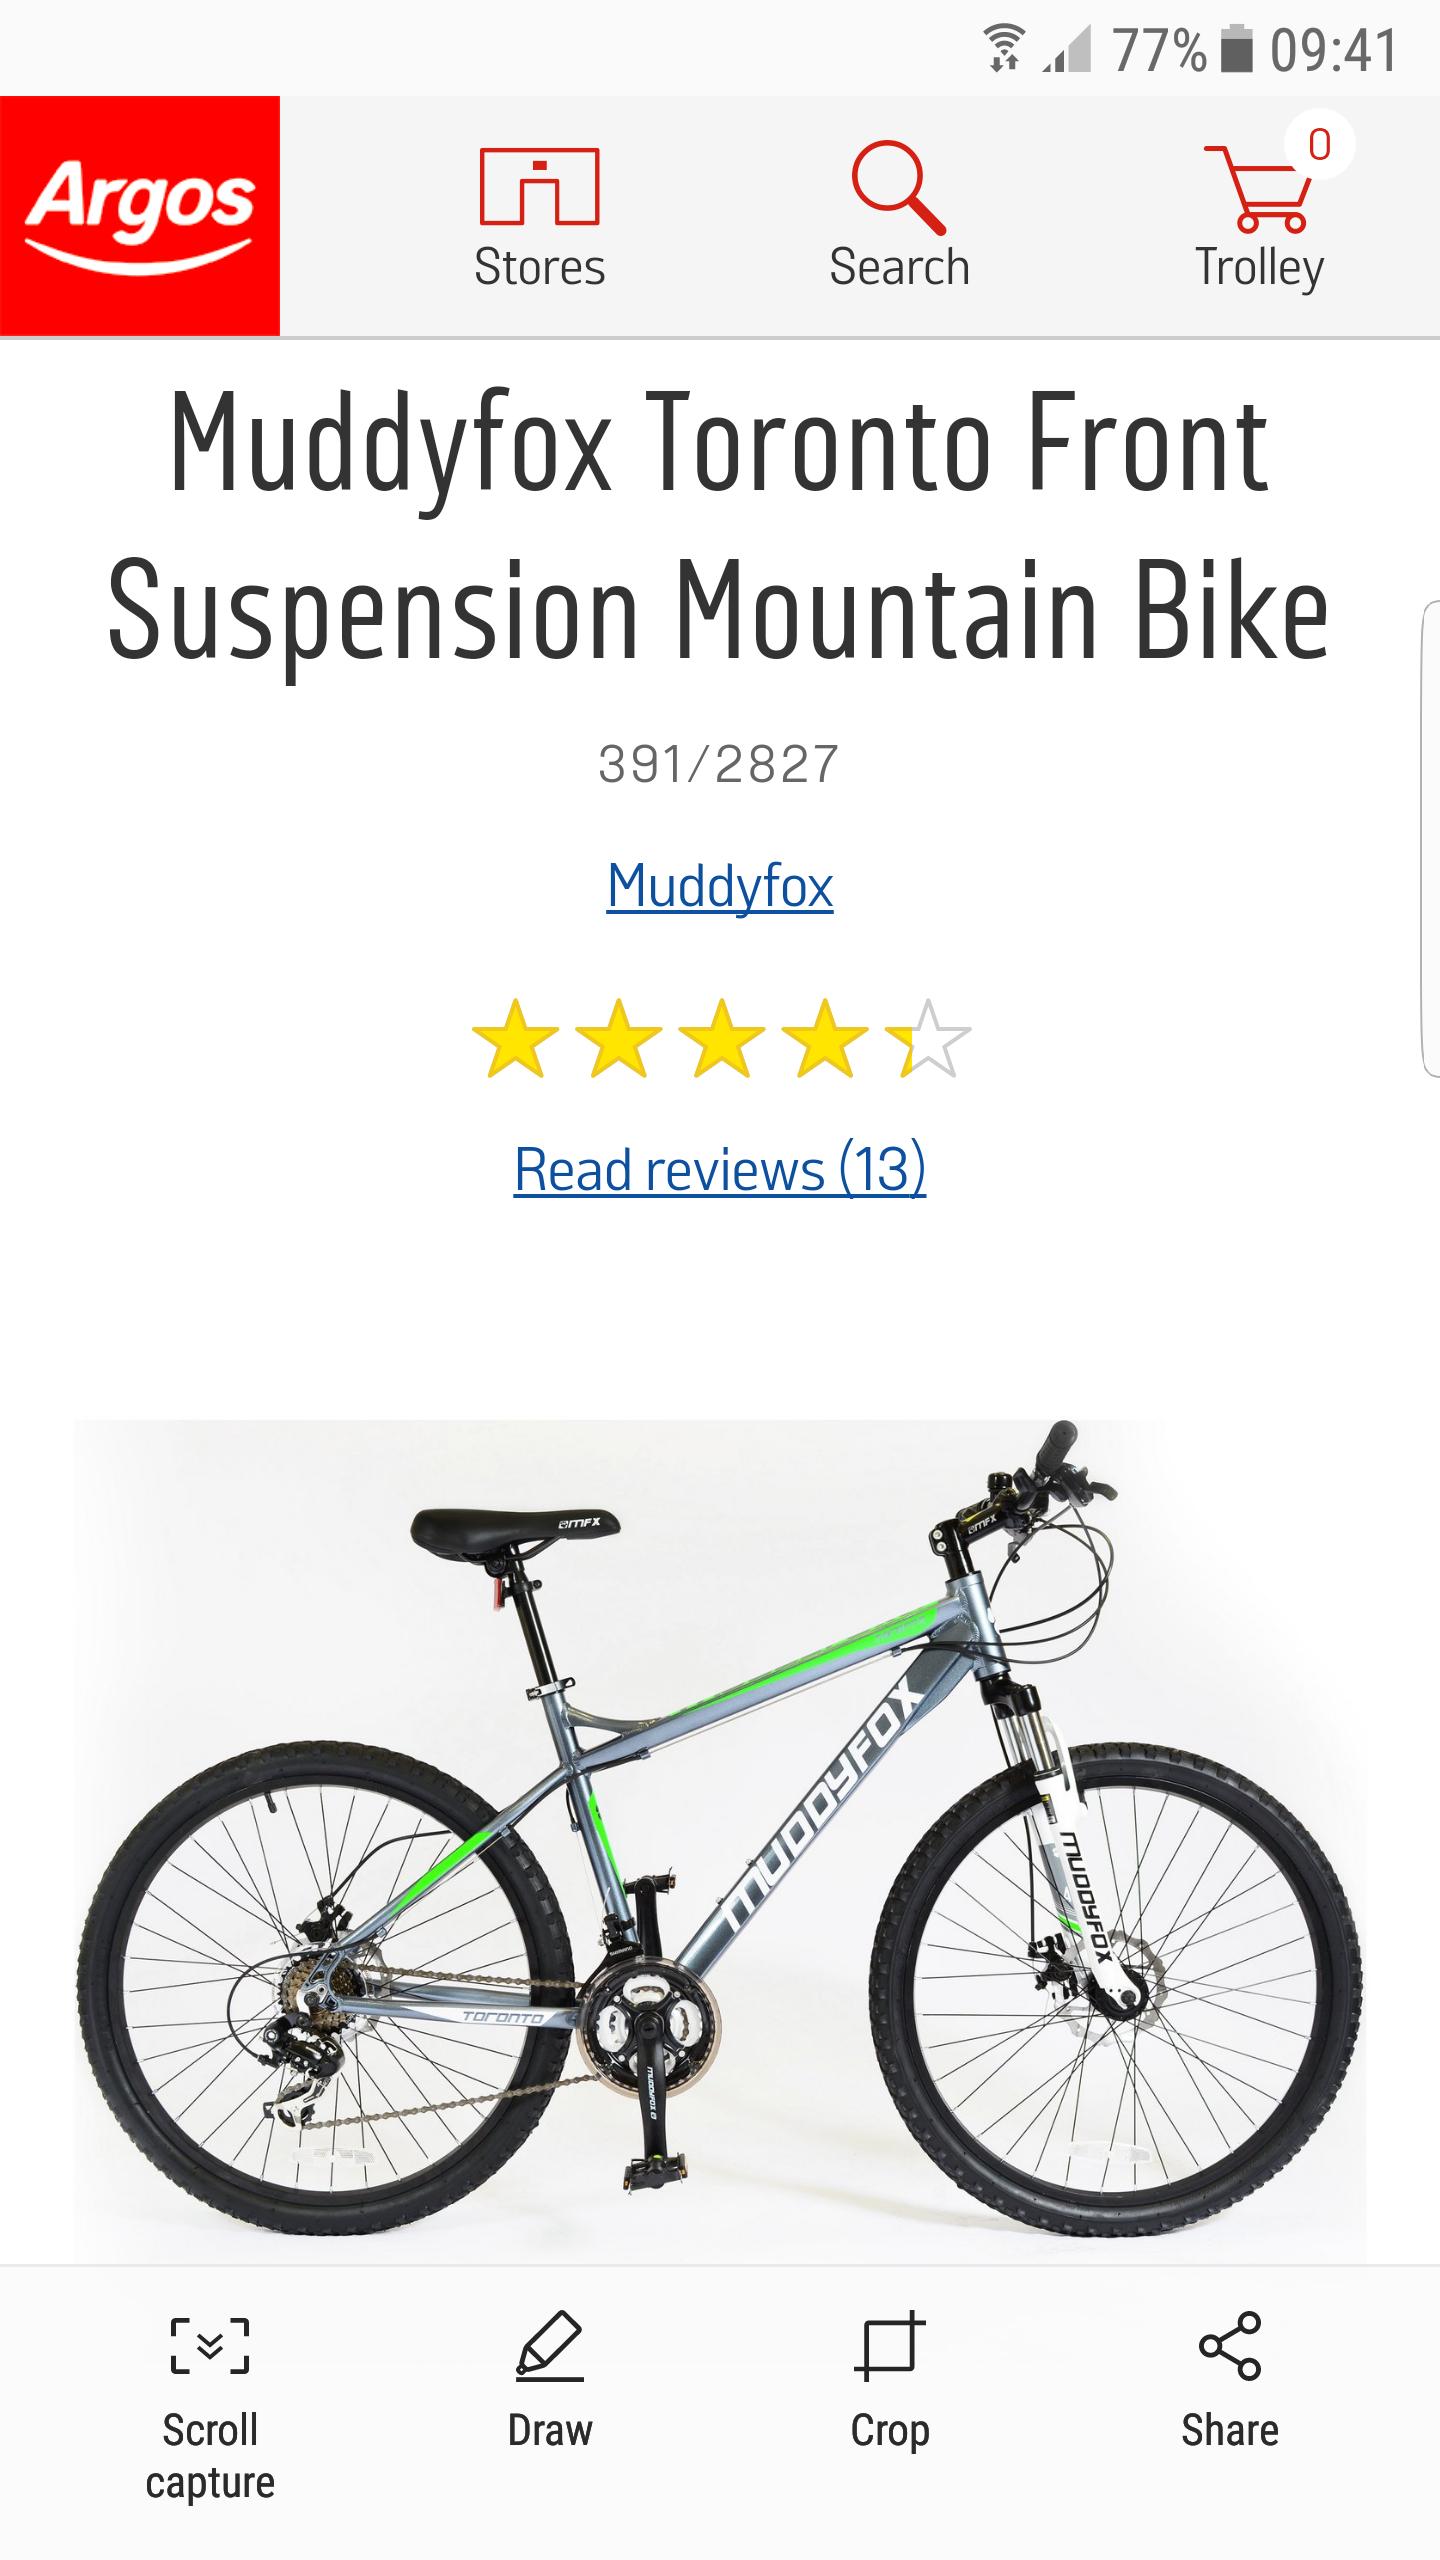 Muddyfox Toronto Front Suspension Mountain Bike - £263.99 @ Argos